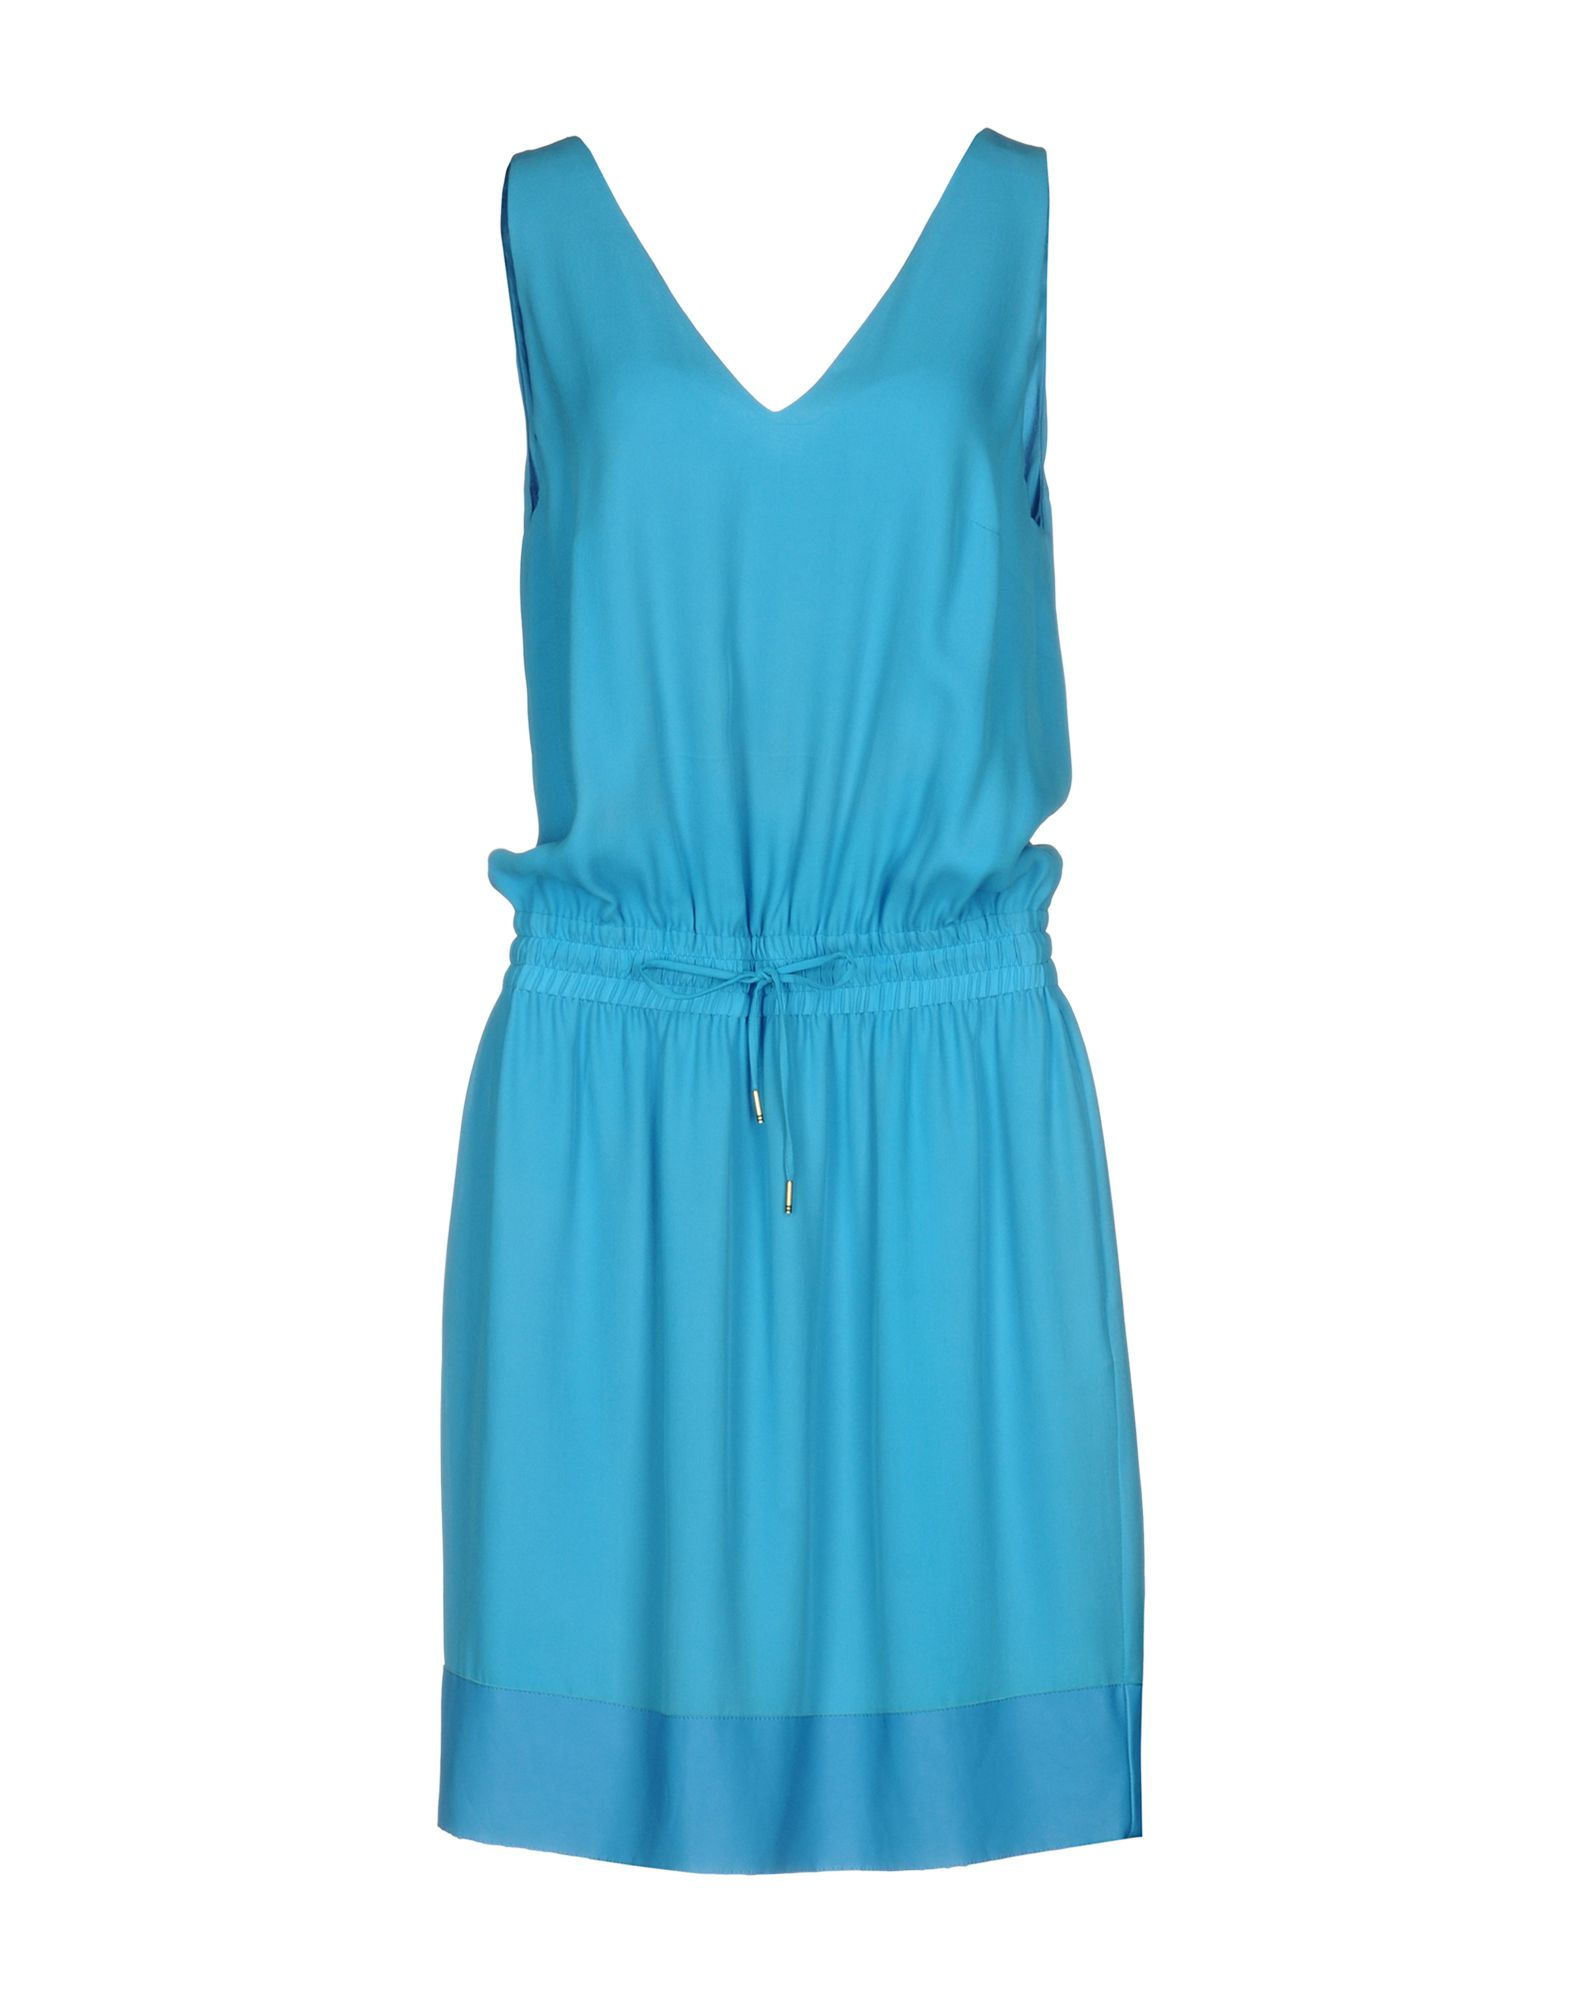 DIRK BIKKEMBERGS Платье до колена цены онлайн